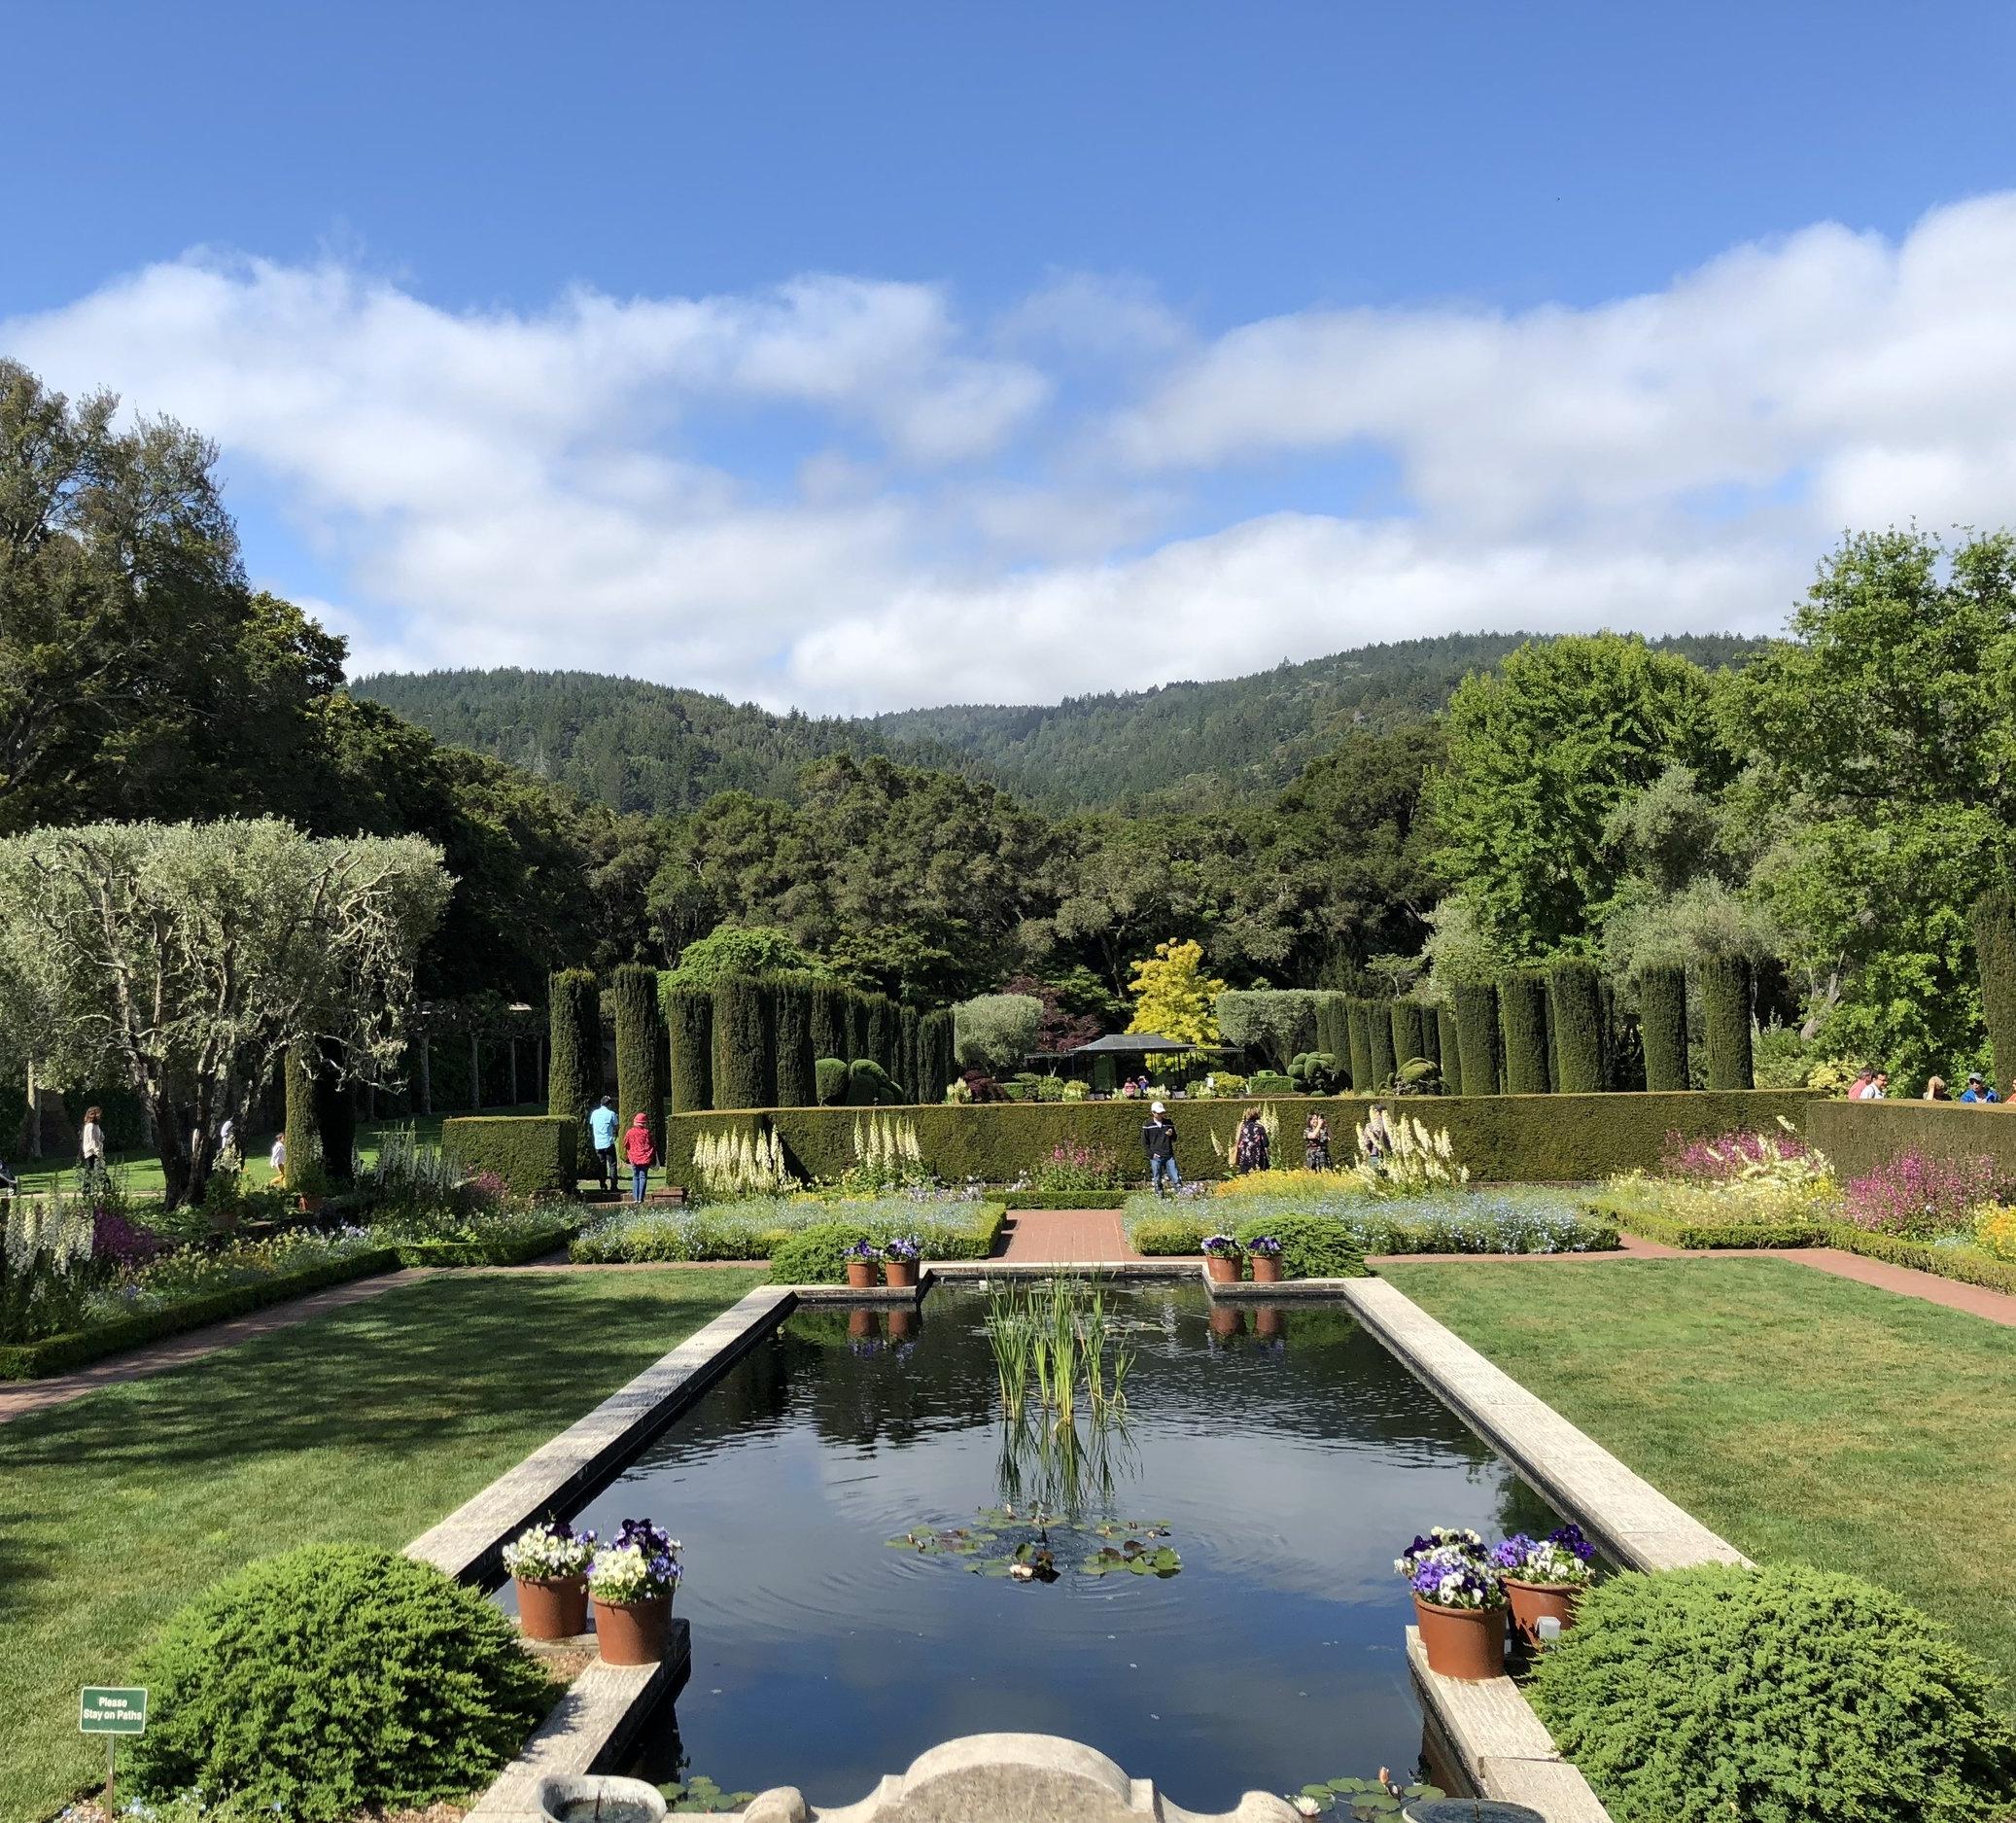 The Beauty of Filoli: Sunken Garden